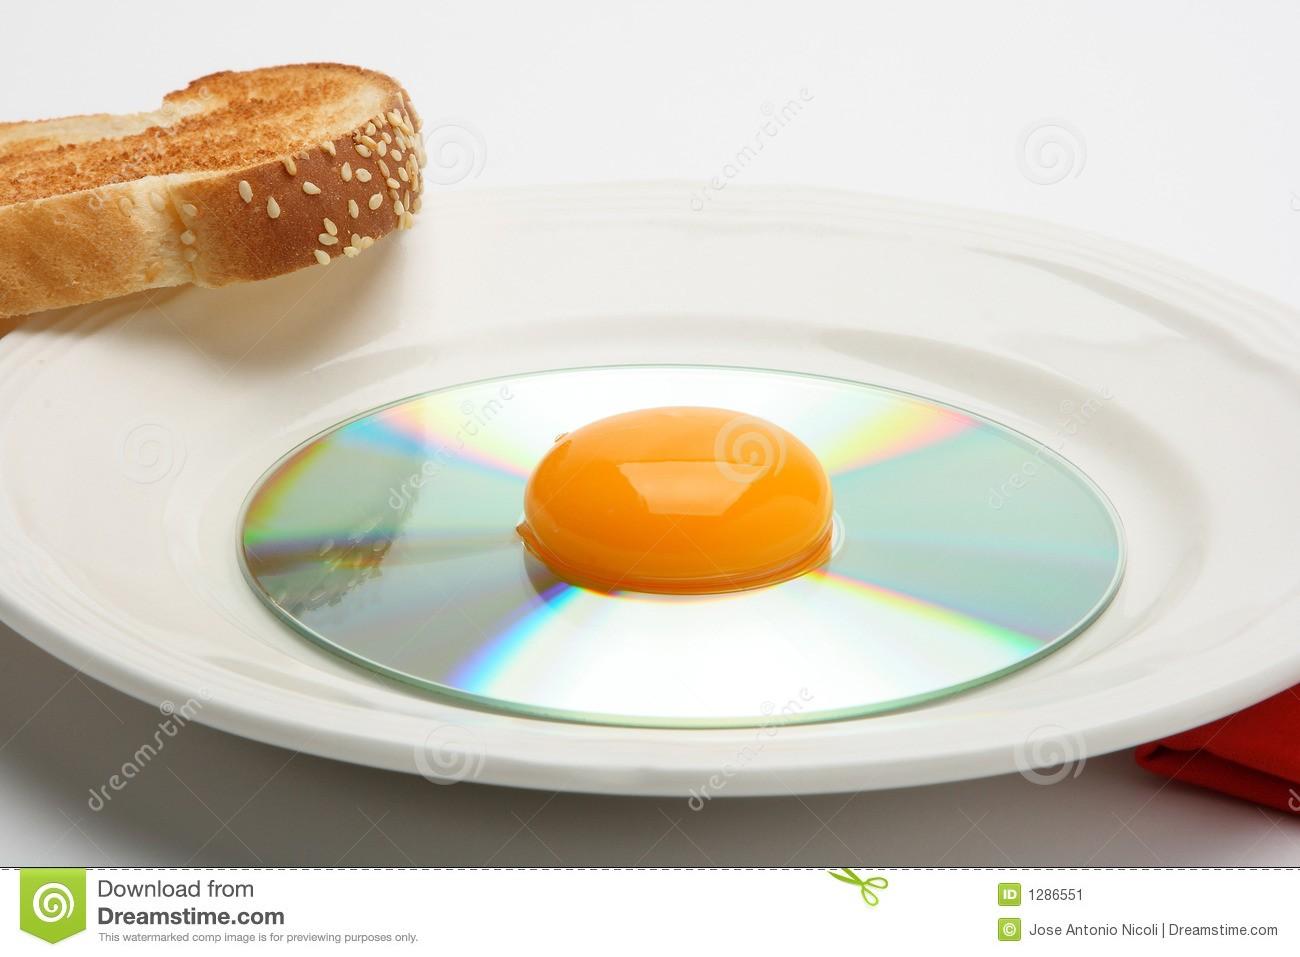 compact-disc-breakfast-1286551.jpg